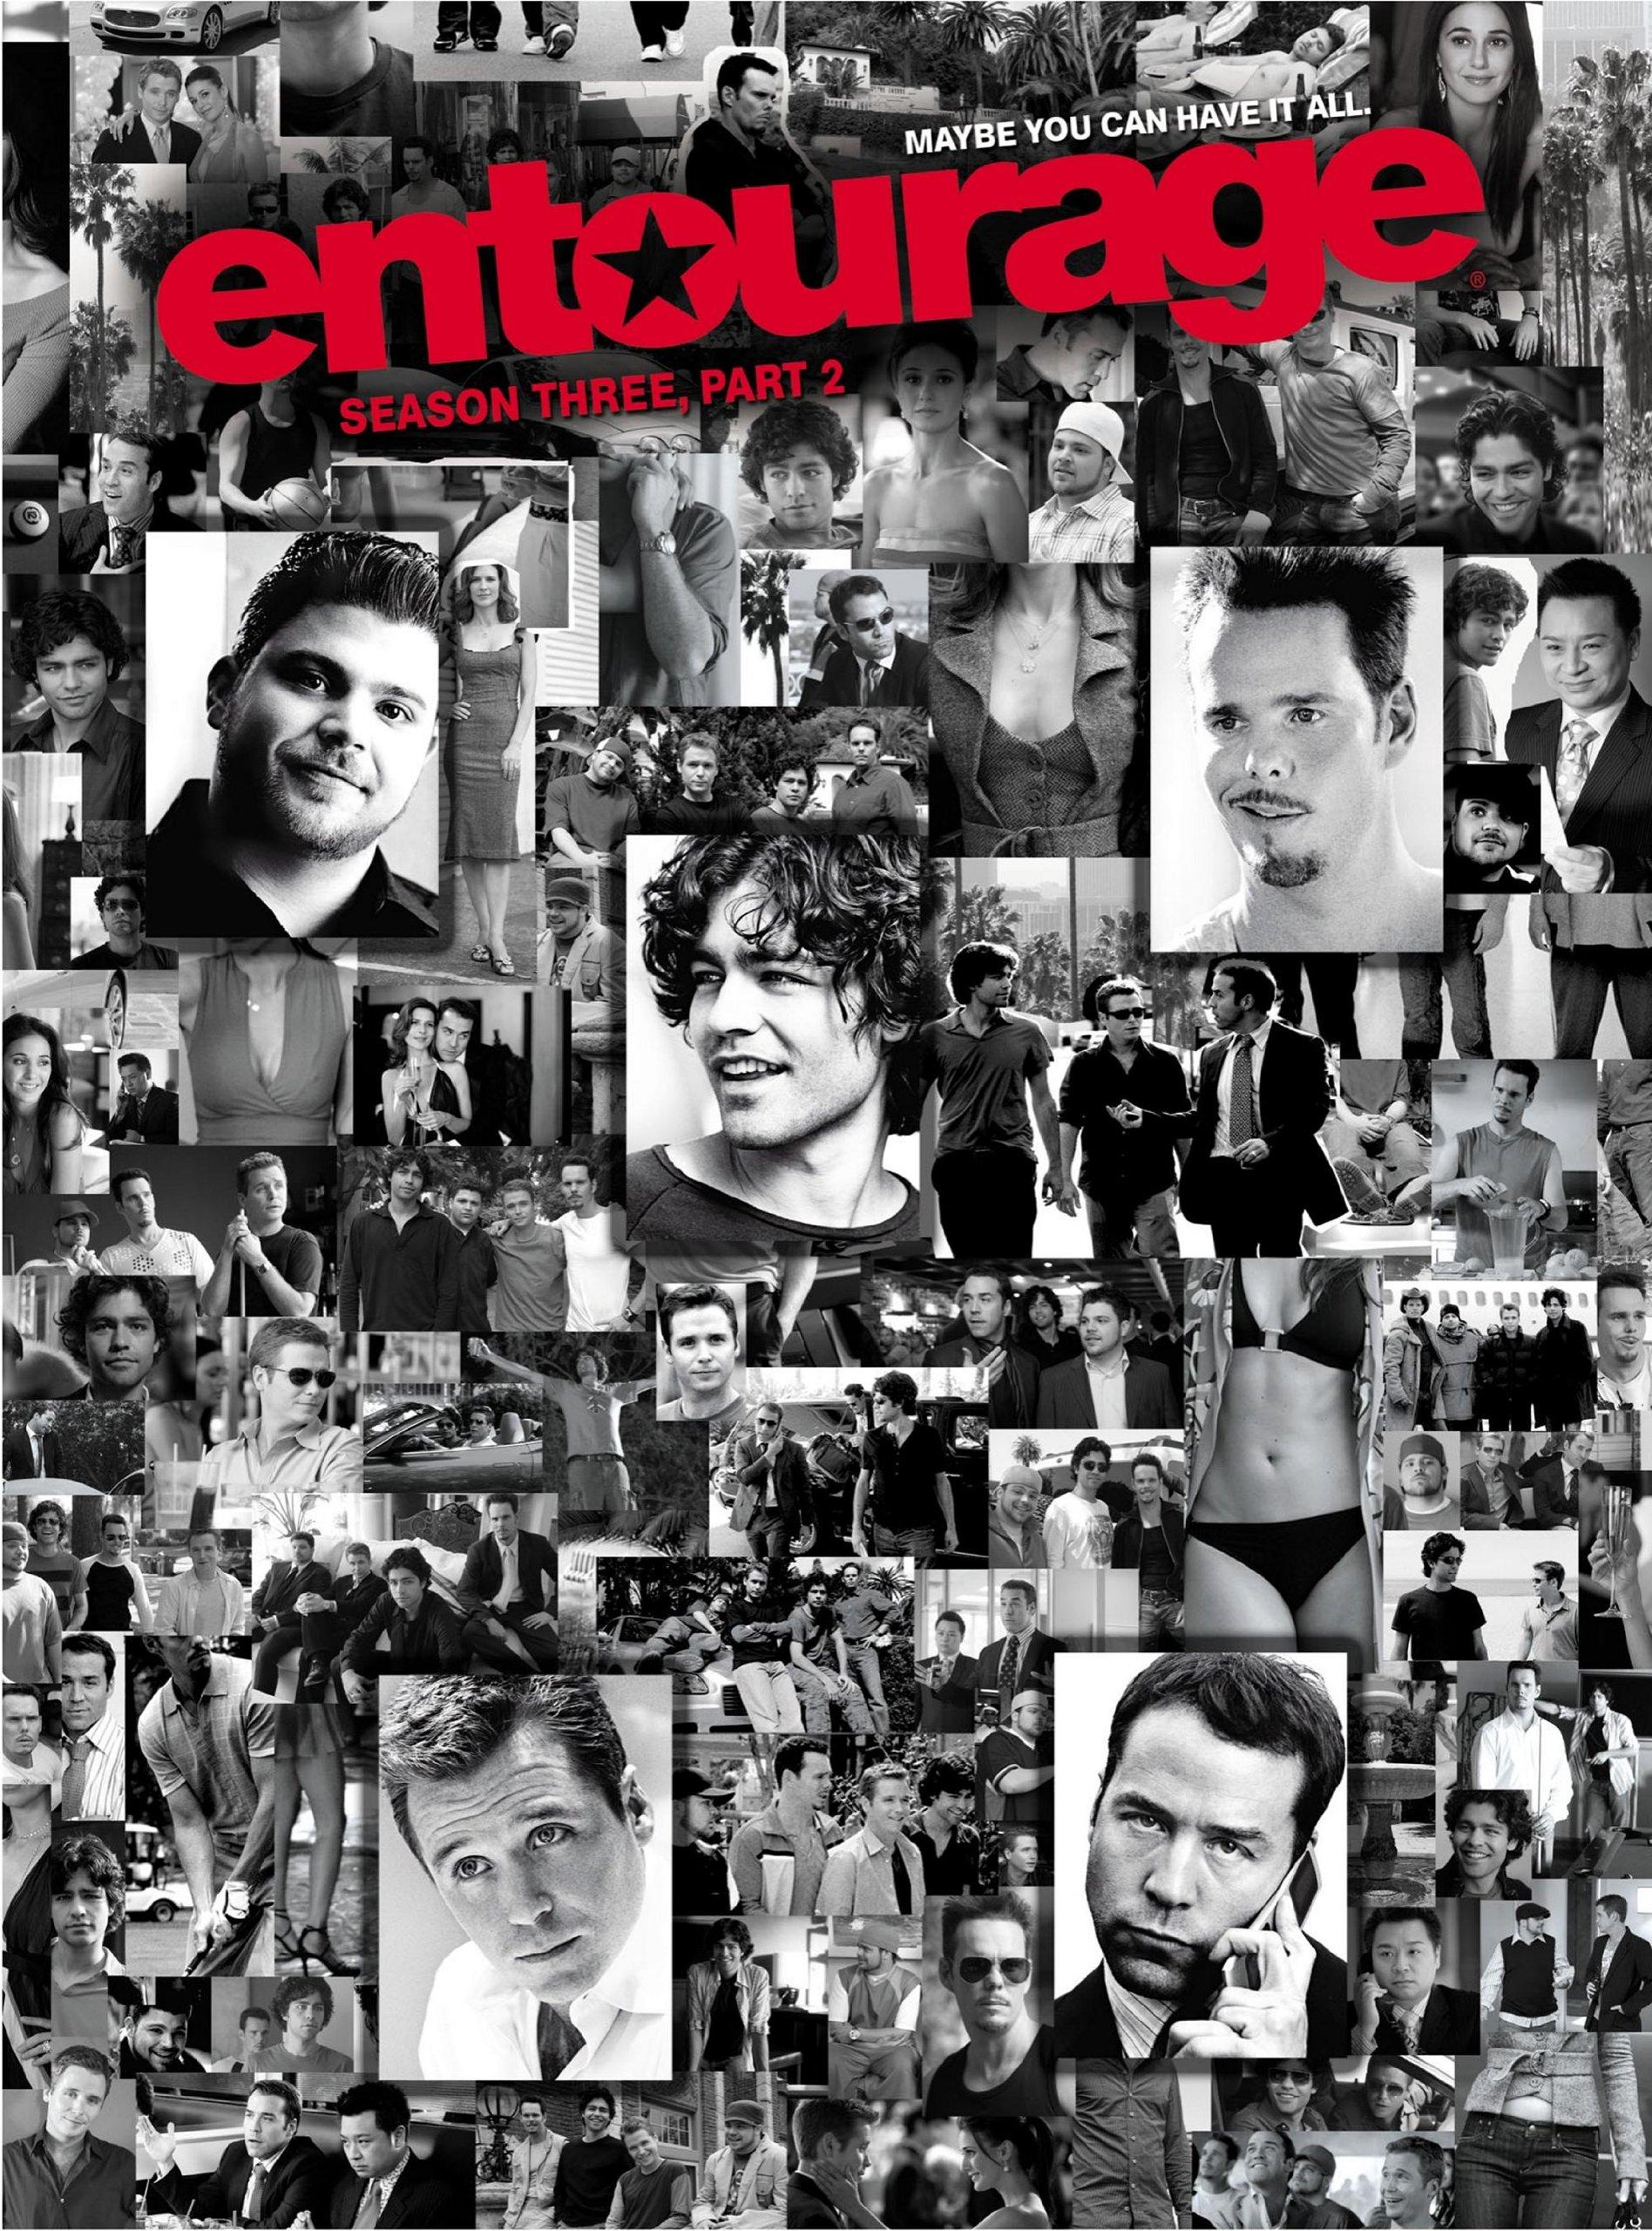 DVD : Entourage: Season Three Part 2 (Digipack Packaging, 2 Disc)